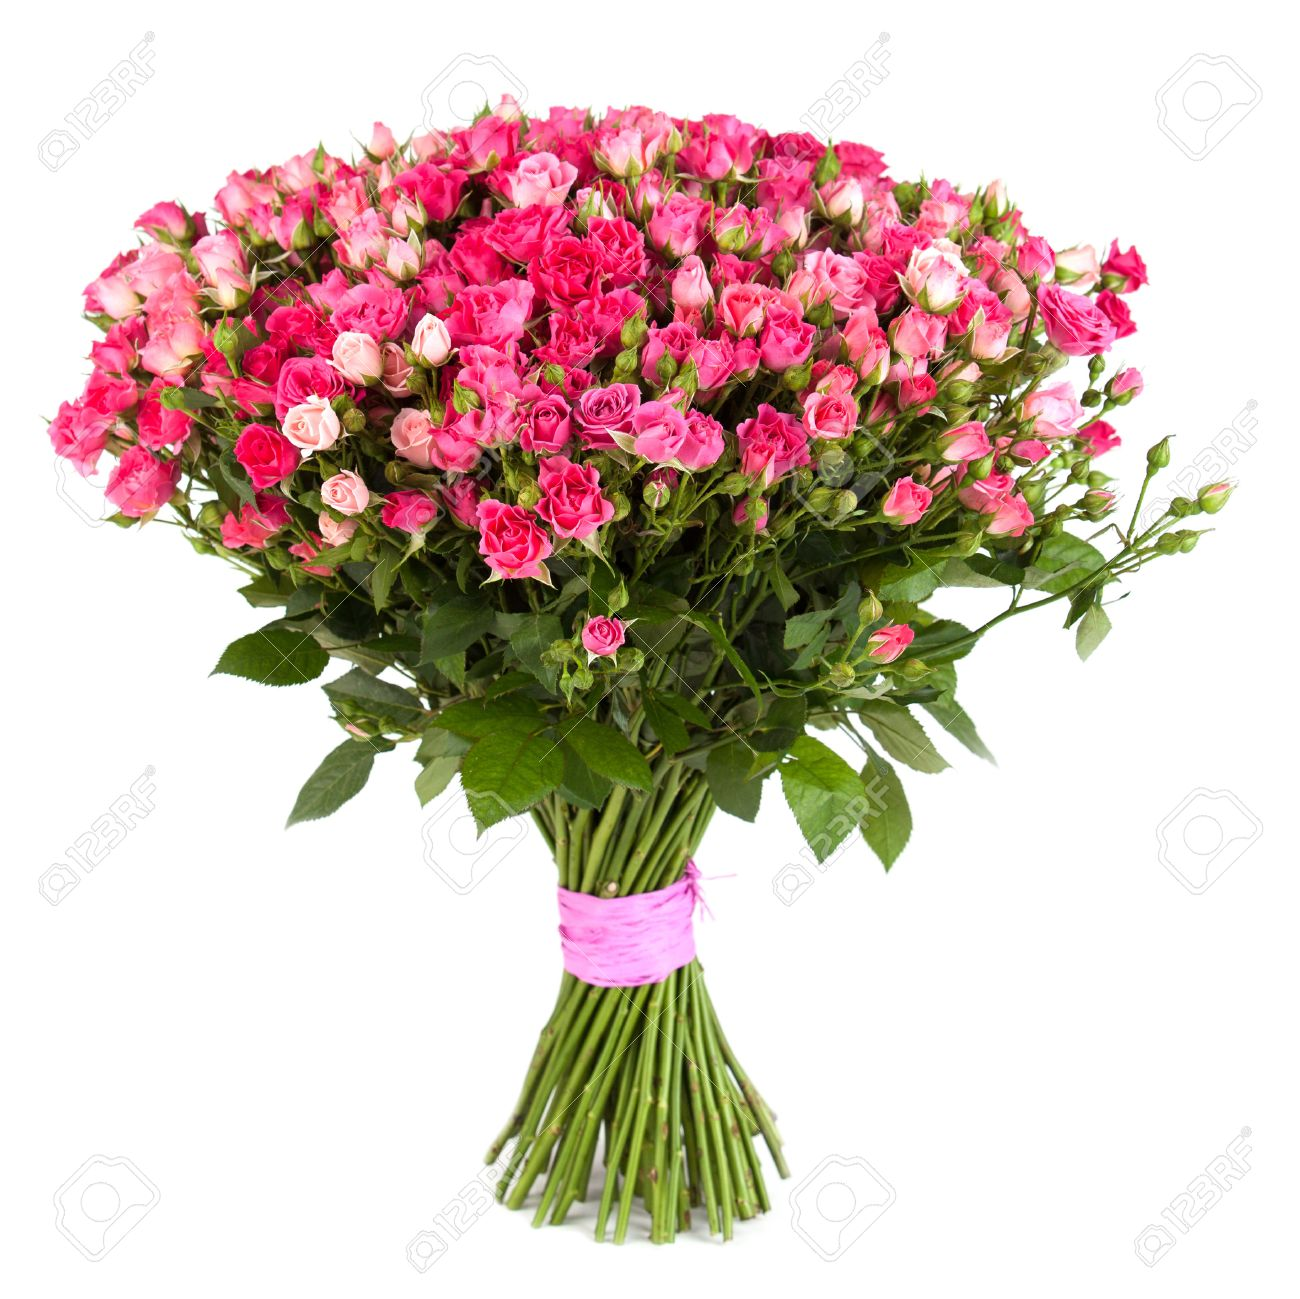 Big flower bouquet images gallery flower wallpaper hd big flower bouquet images izmirmasajfo